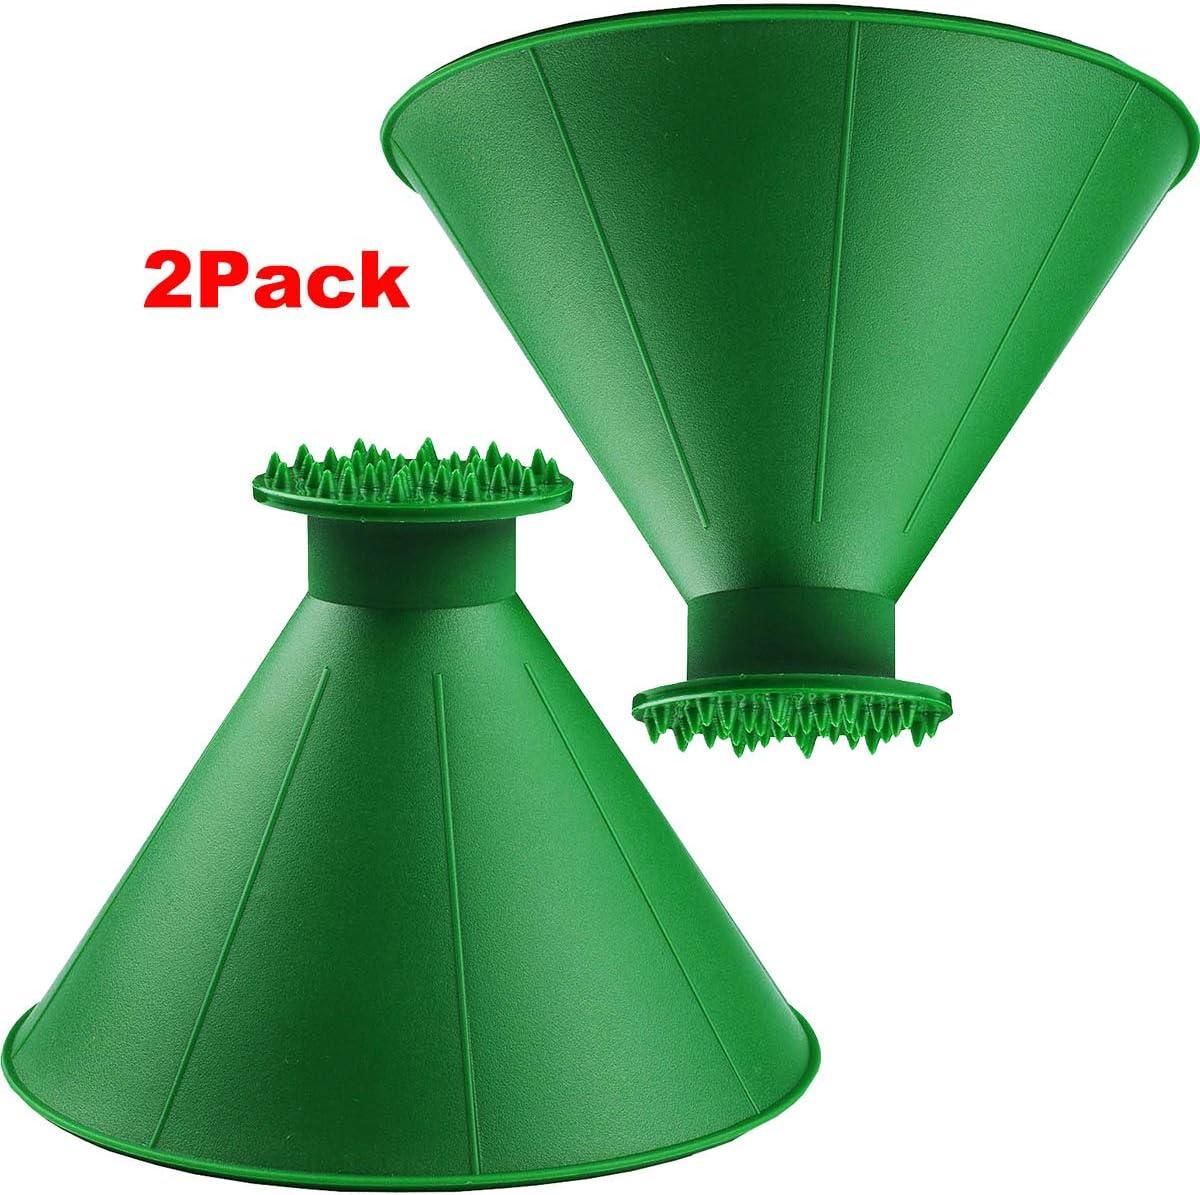 various scrape-a-round ice scrapers 3 Ultimate Scraper Package